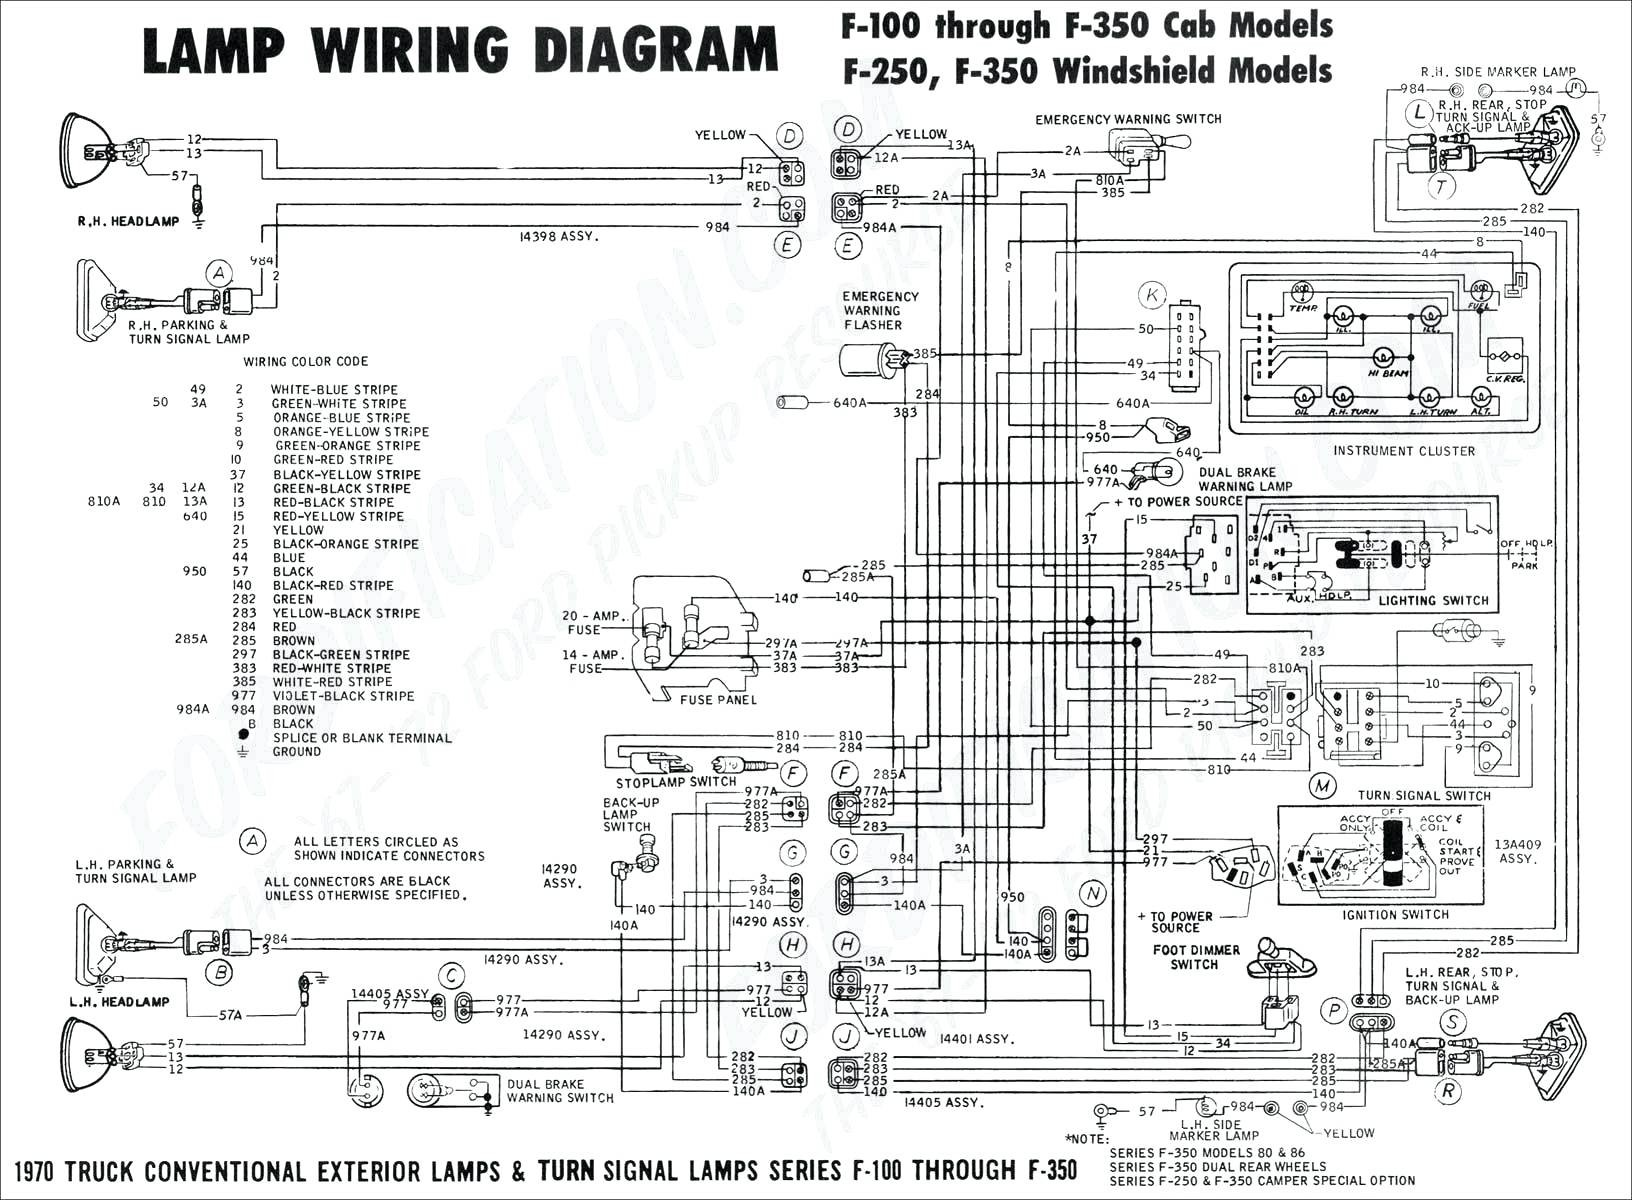 tic toc tach wiring diagram wiring diagram1968 camaro tic toc tach wiring  diagram best wiring librarytic